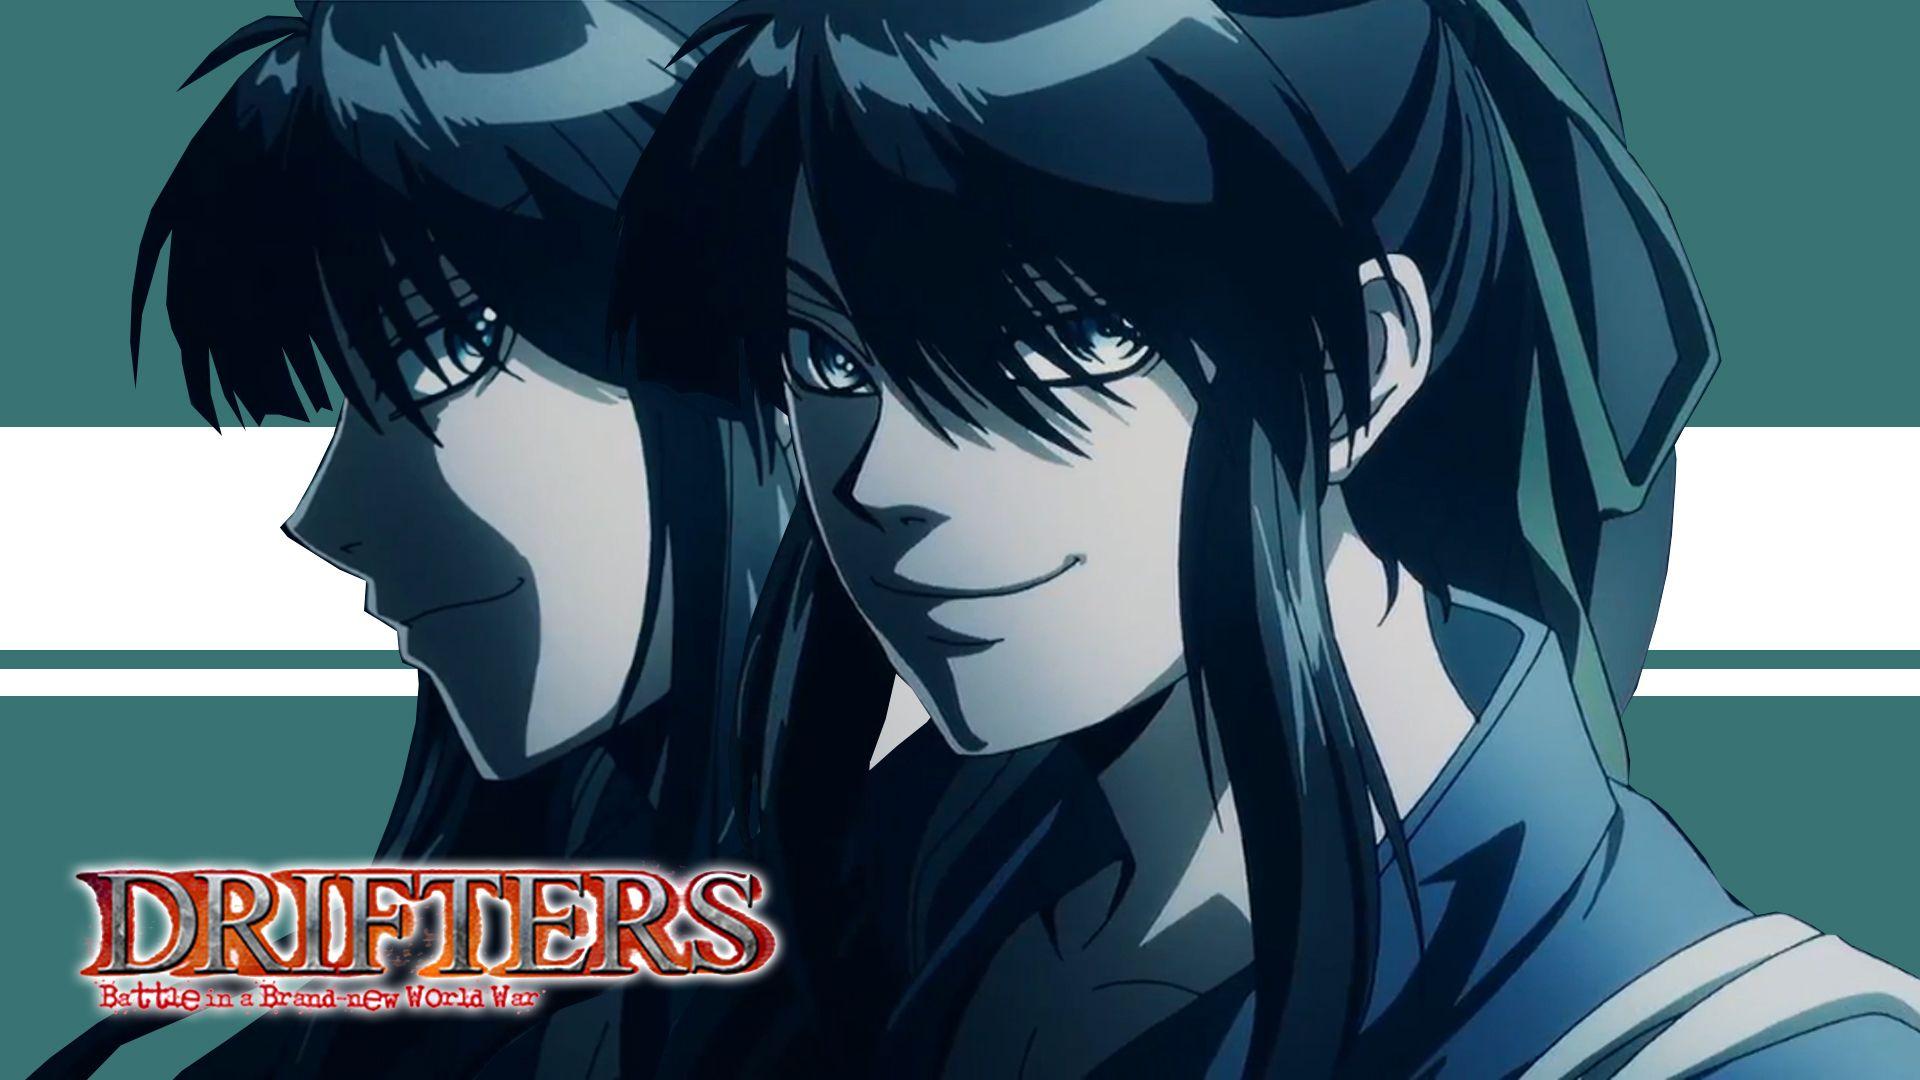 Nasu Anime Drifters Wallpaper HD 2951